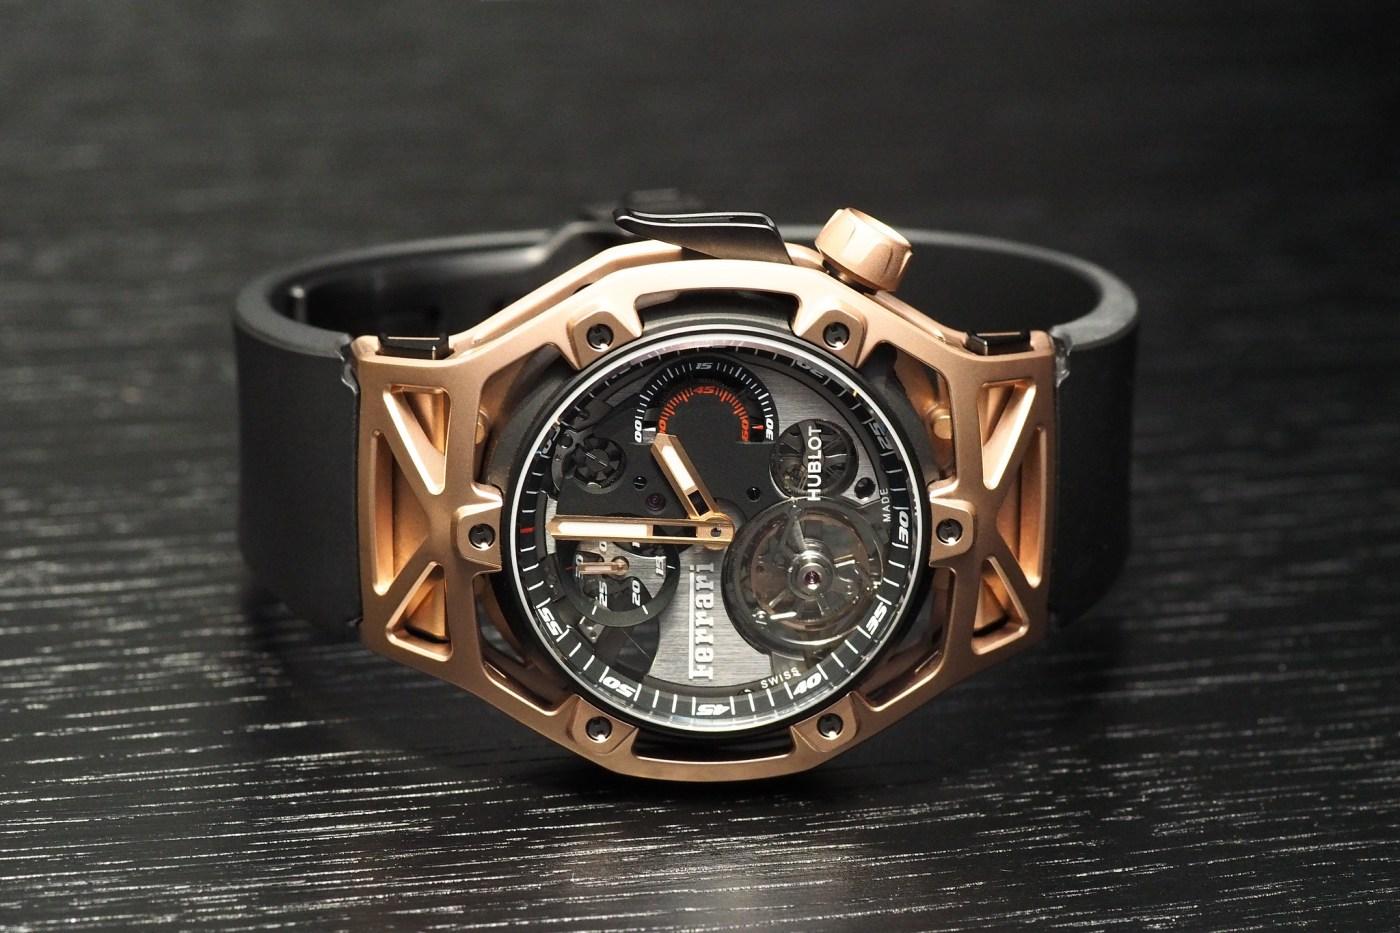 Techframe Ferrari Tourbillon Chronograph King Gold